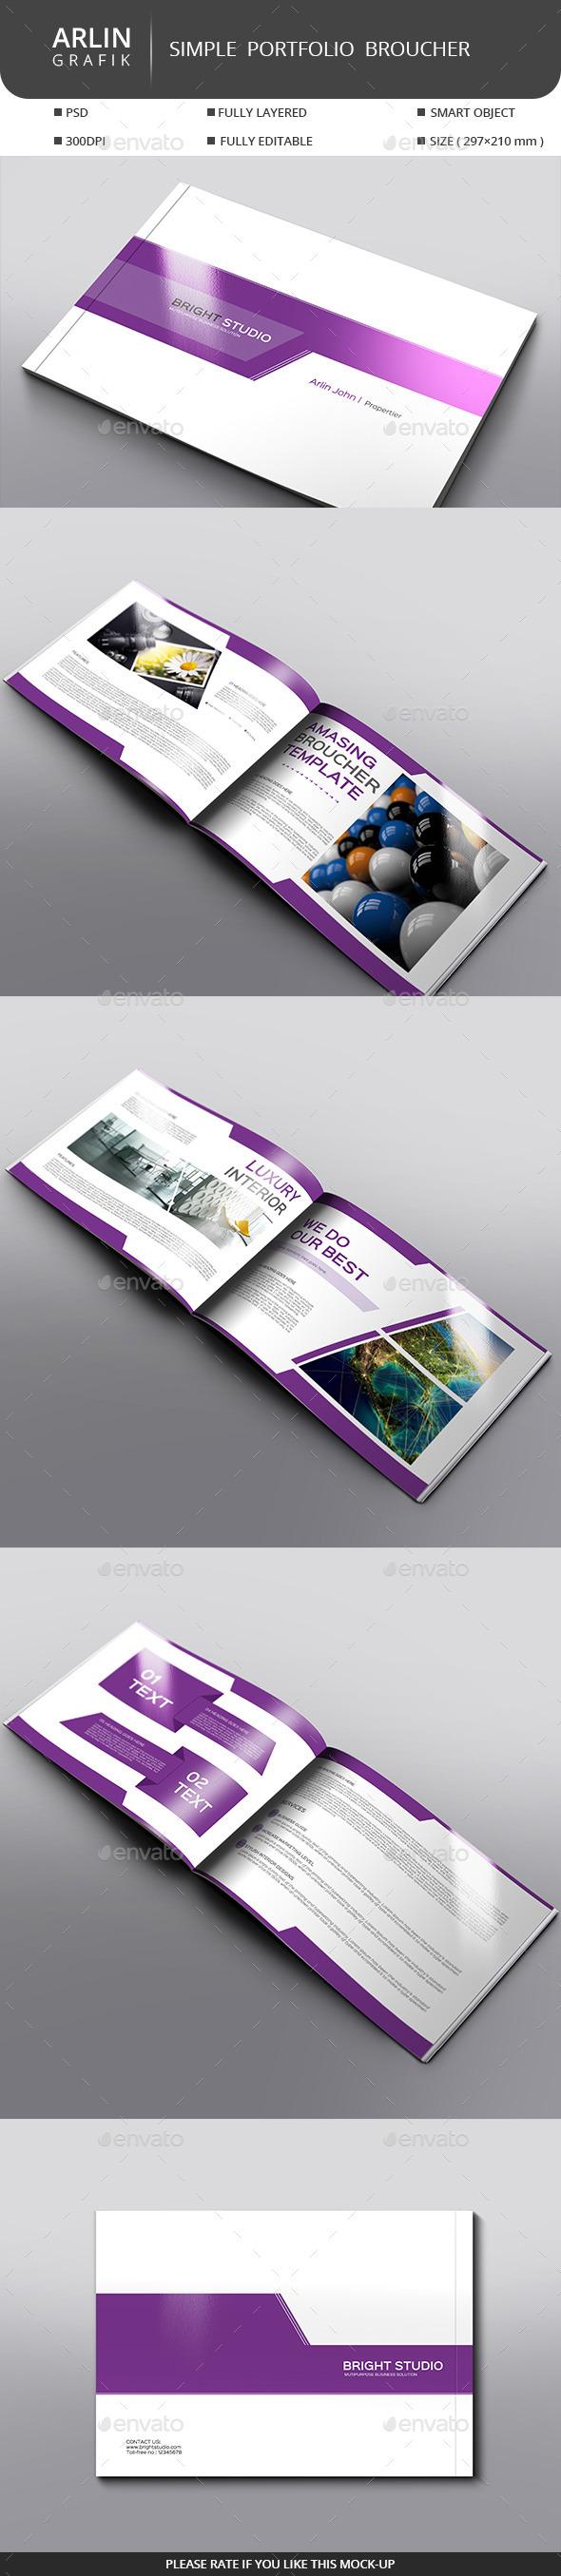 Simple Portfolio V 01  - Portfolio Brochures